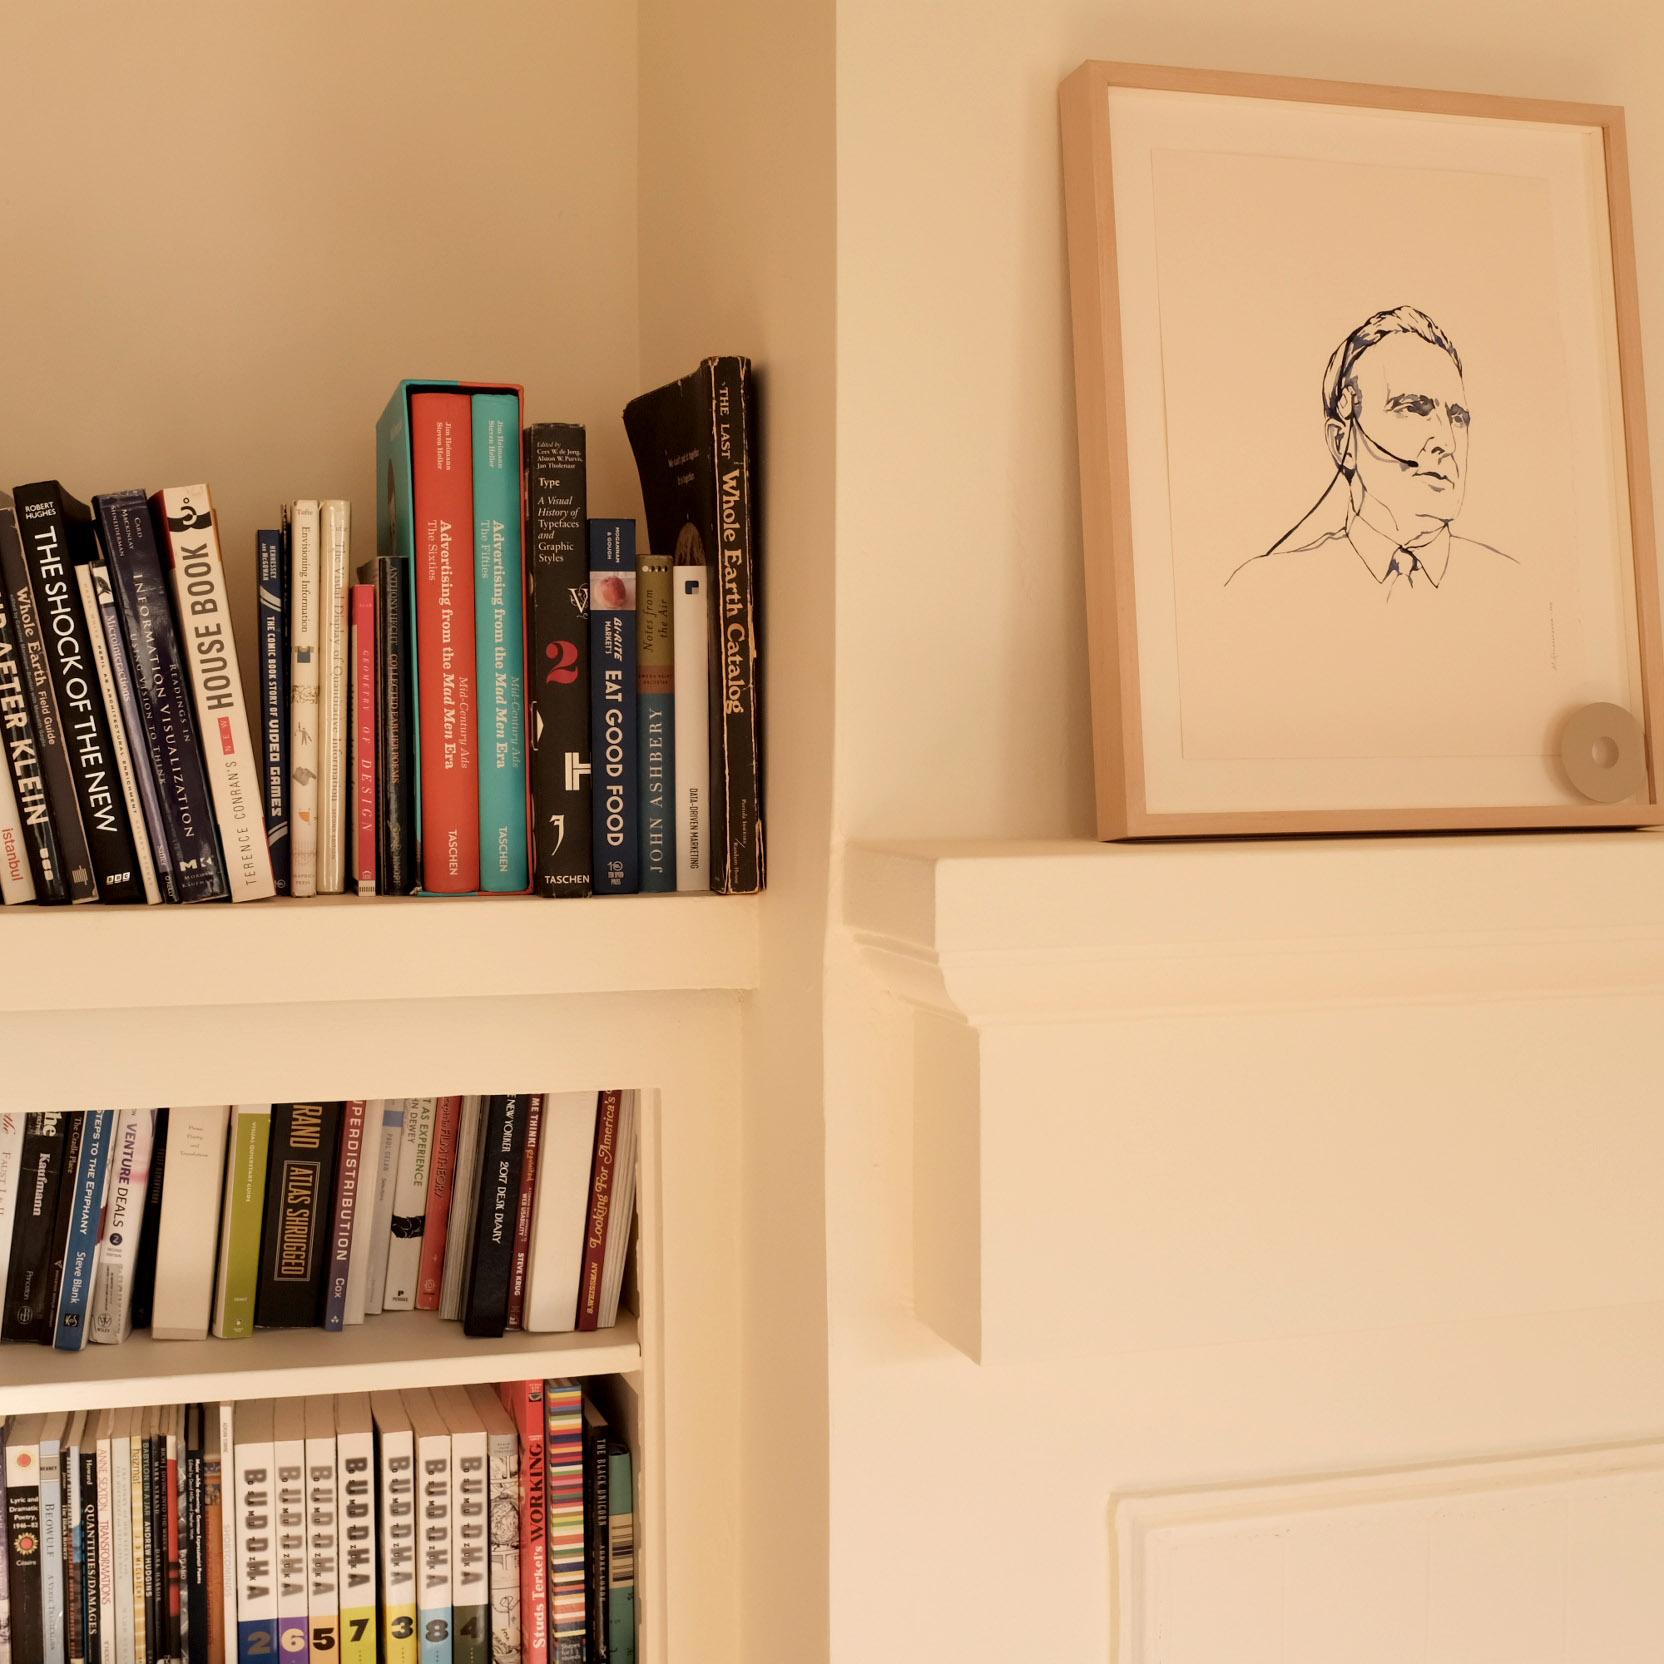 IMAGE: Bookshelves at Notion office